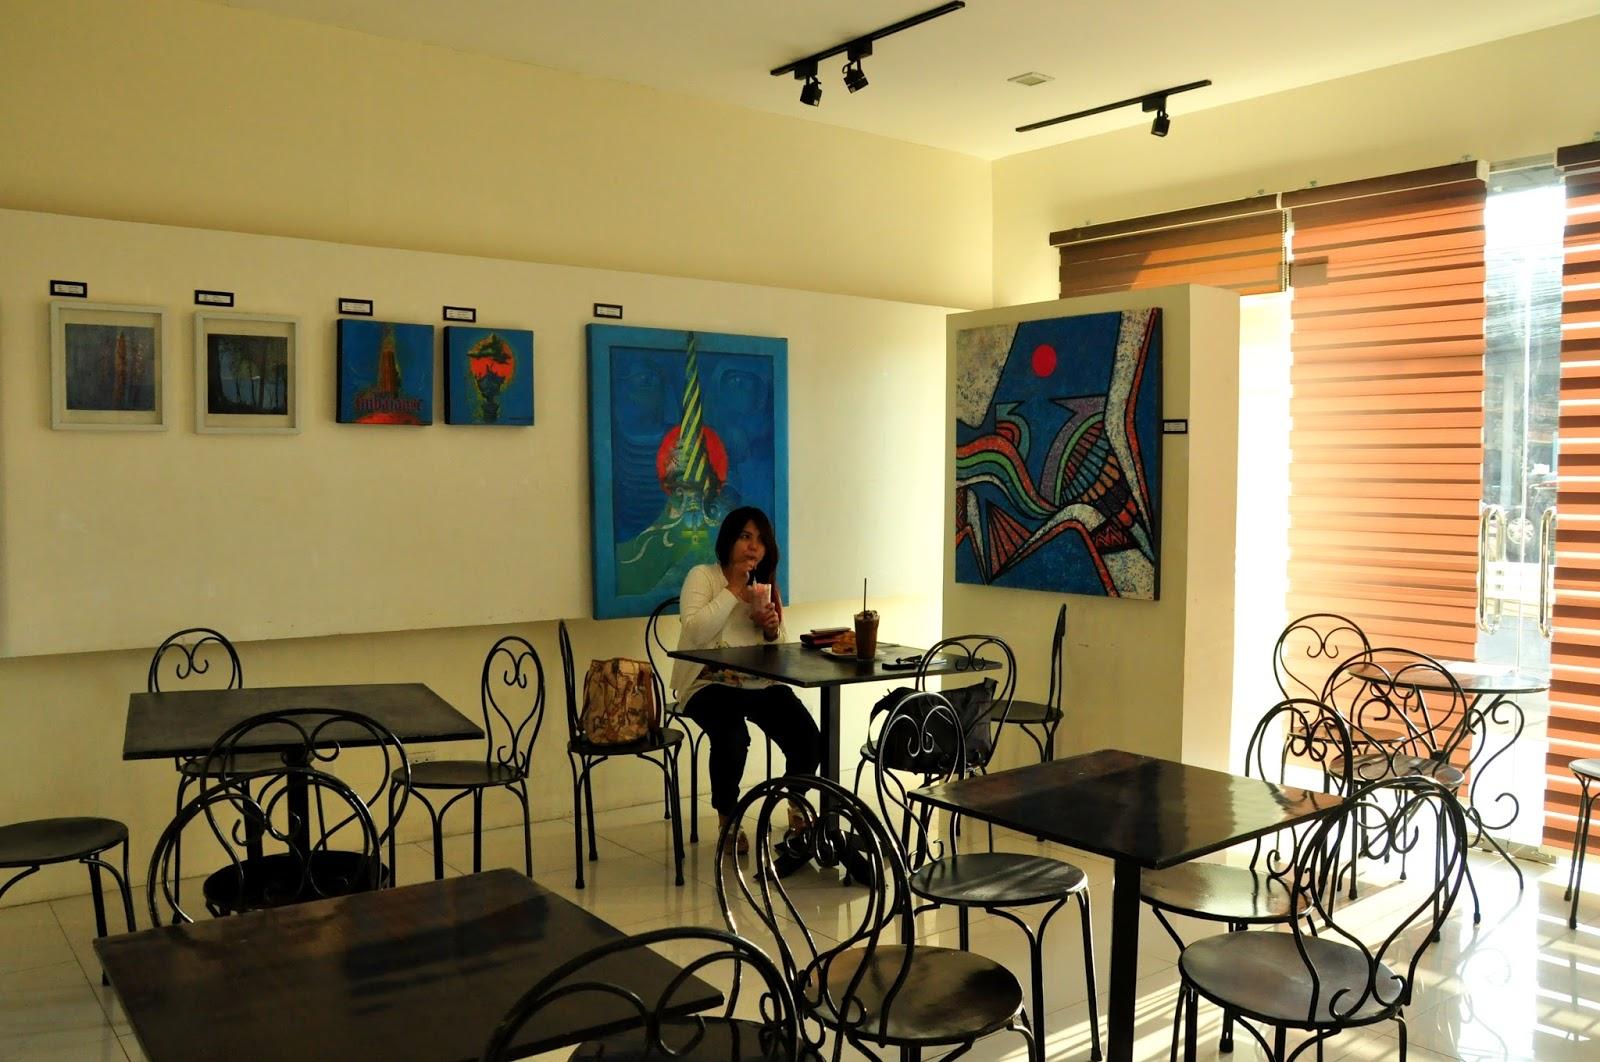 CDOFoodtrip: Capricho Art Cafe - inCDO